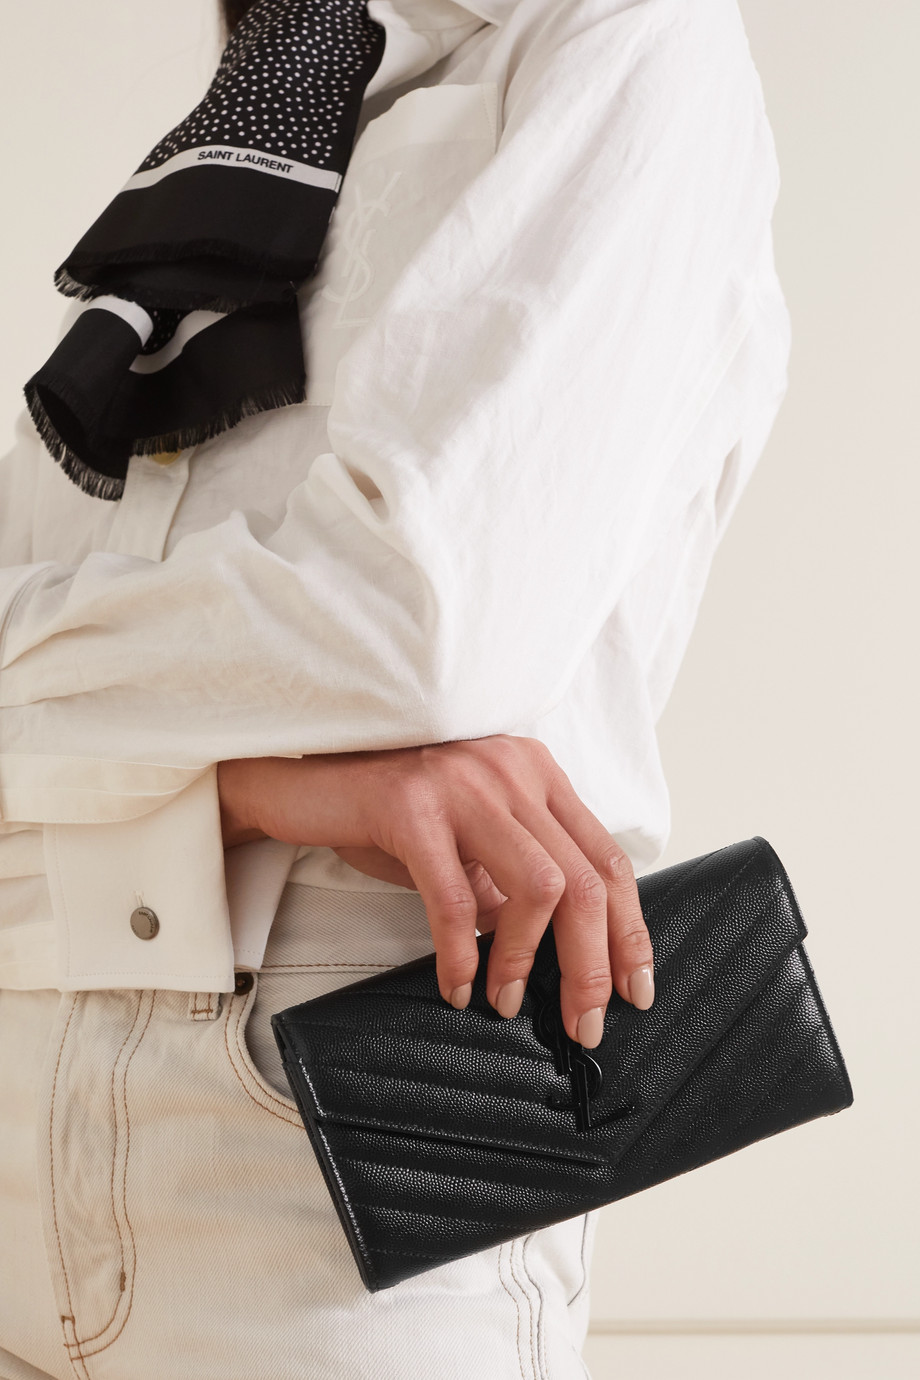 SAINT LAURENT Monogramme Portemonnaie aus gestepptem strukturiertem Leder